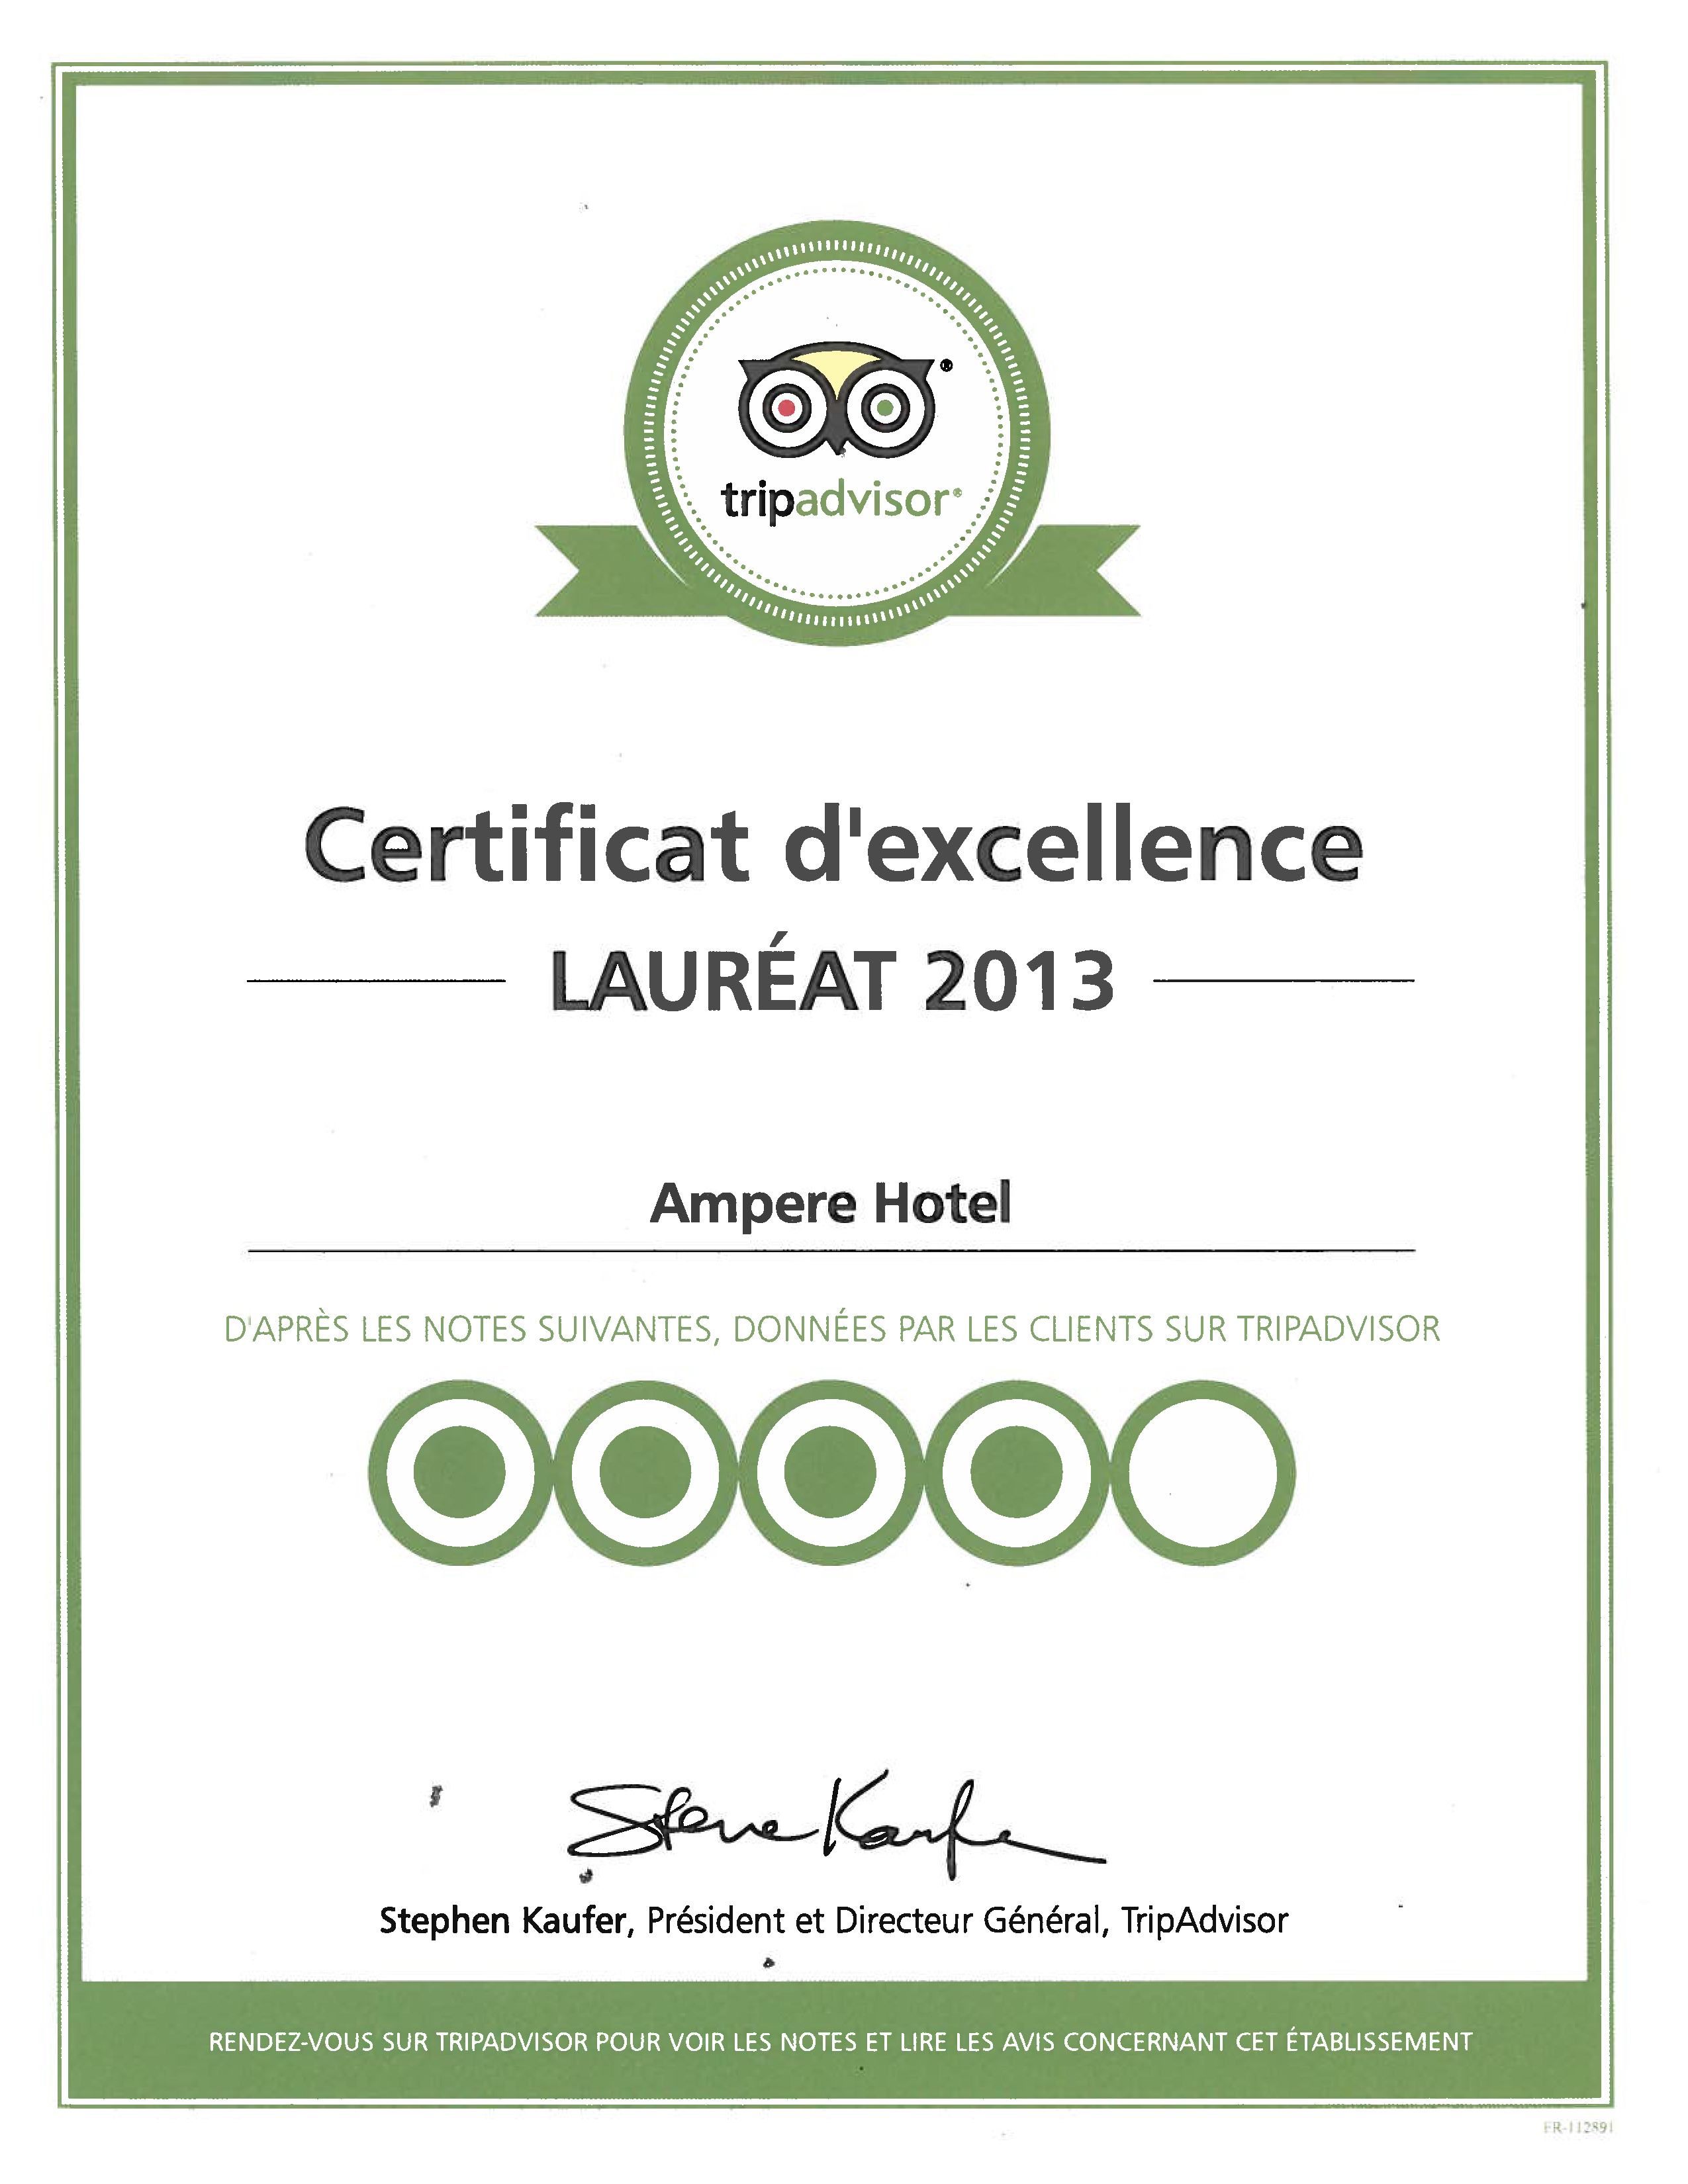 Certificat d'excellence 2013